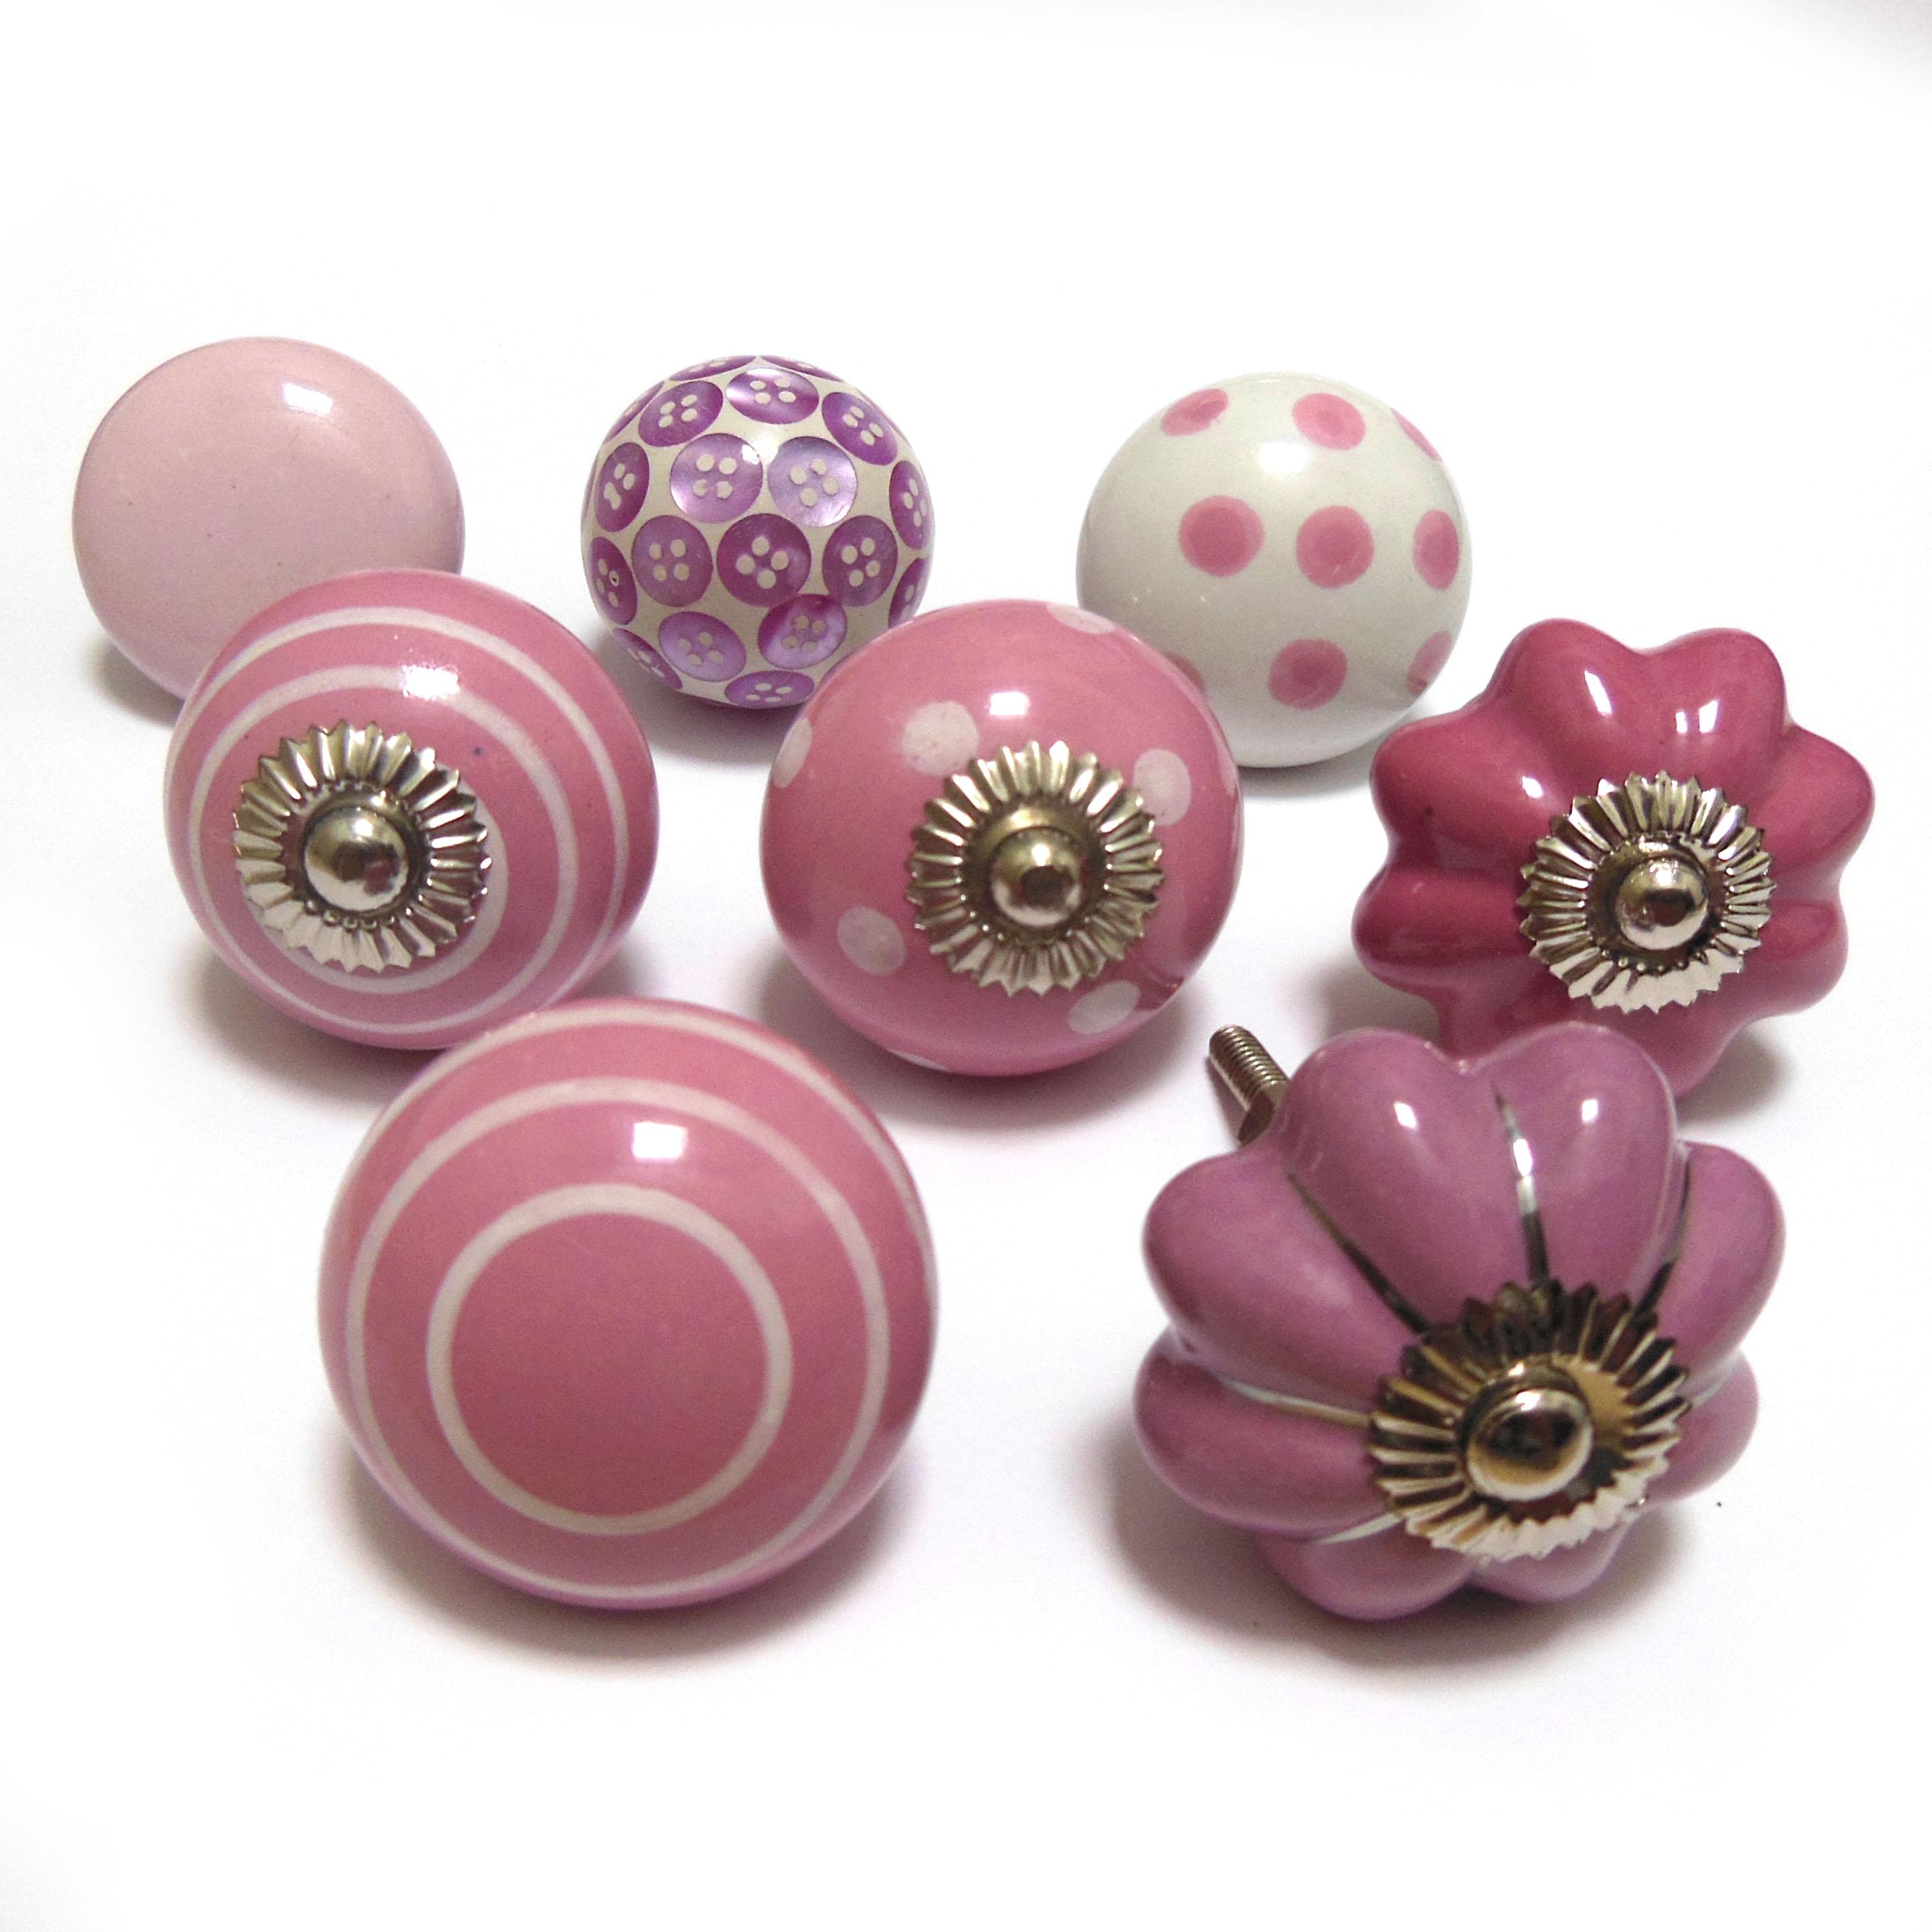 pushka knobs pink cheap ceramic glass cupboard door knobs bulk job lot ebay. Black Bedroom Furniture Sets. Home Design Ideas